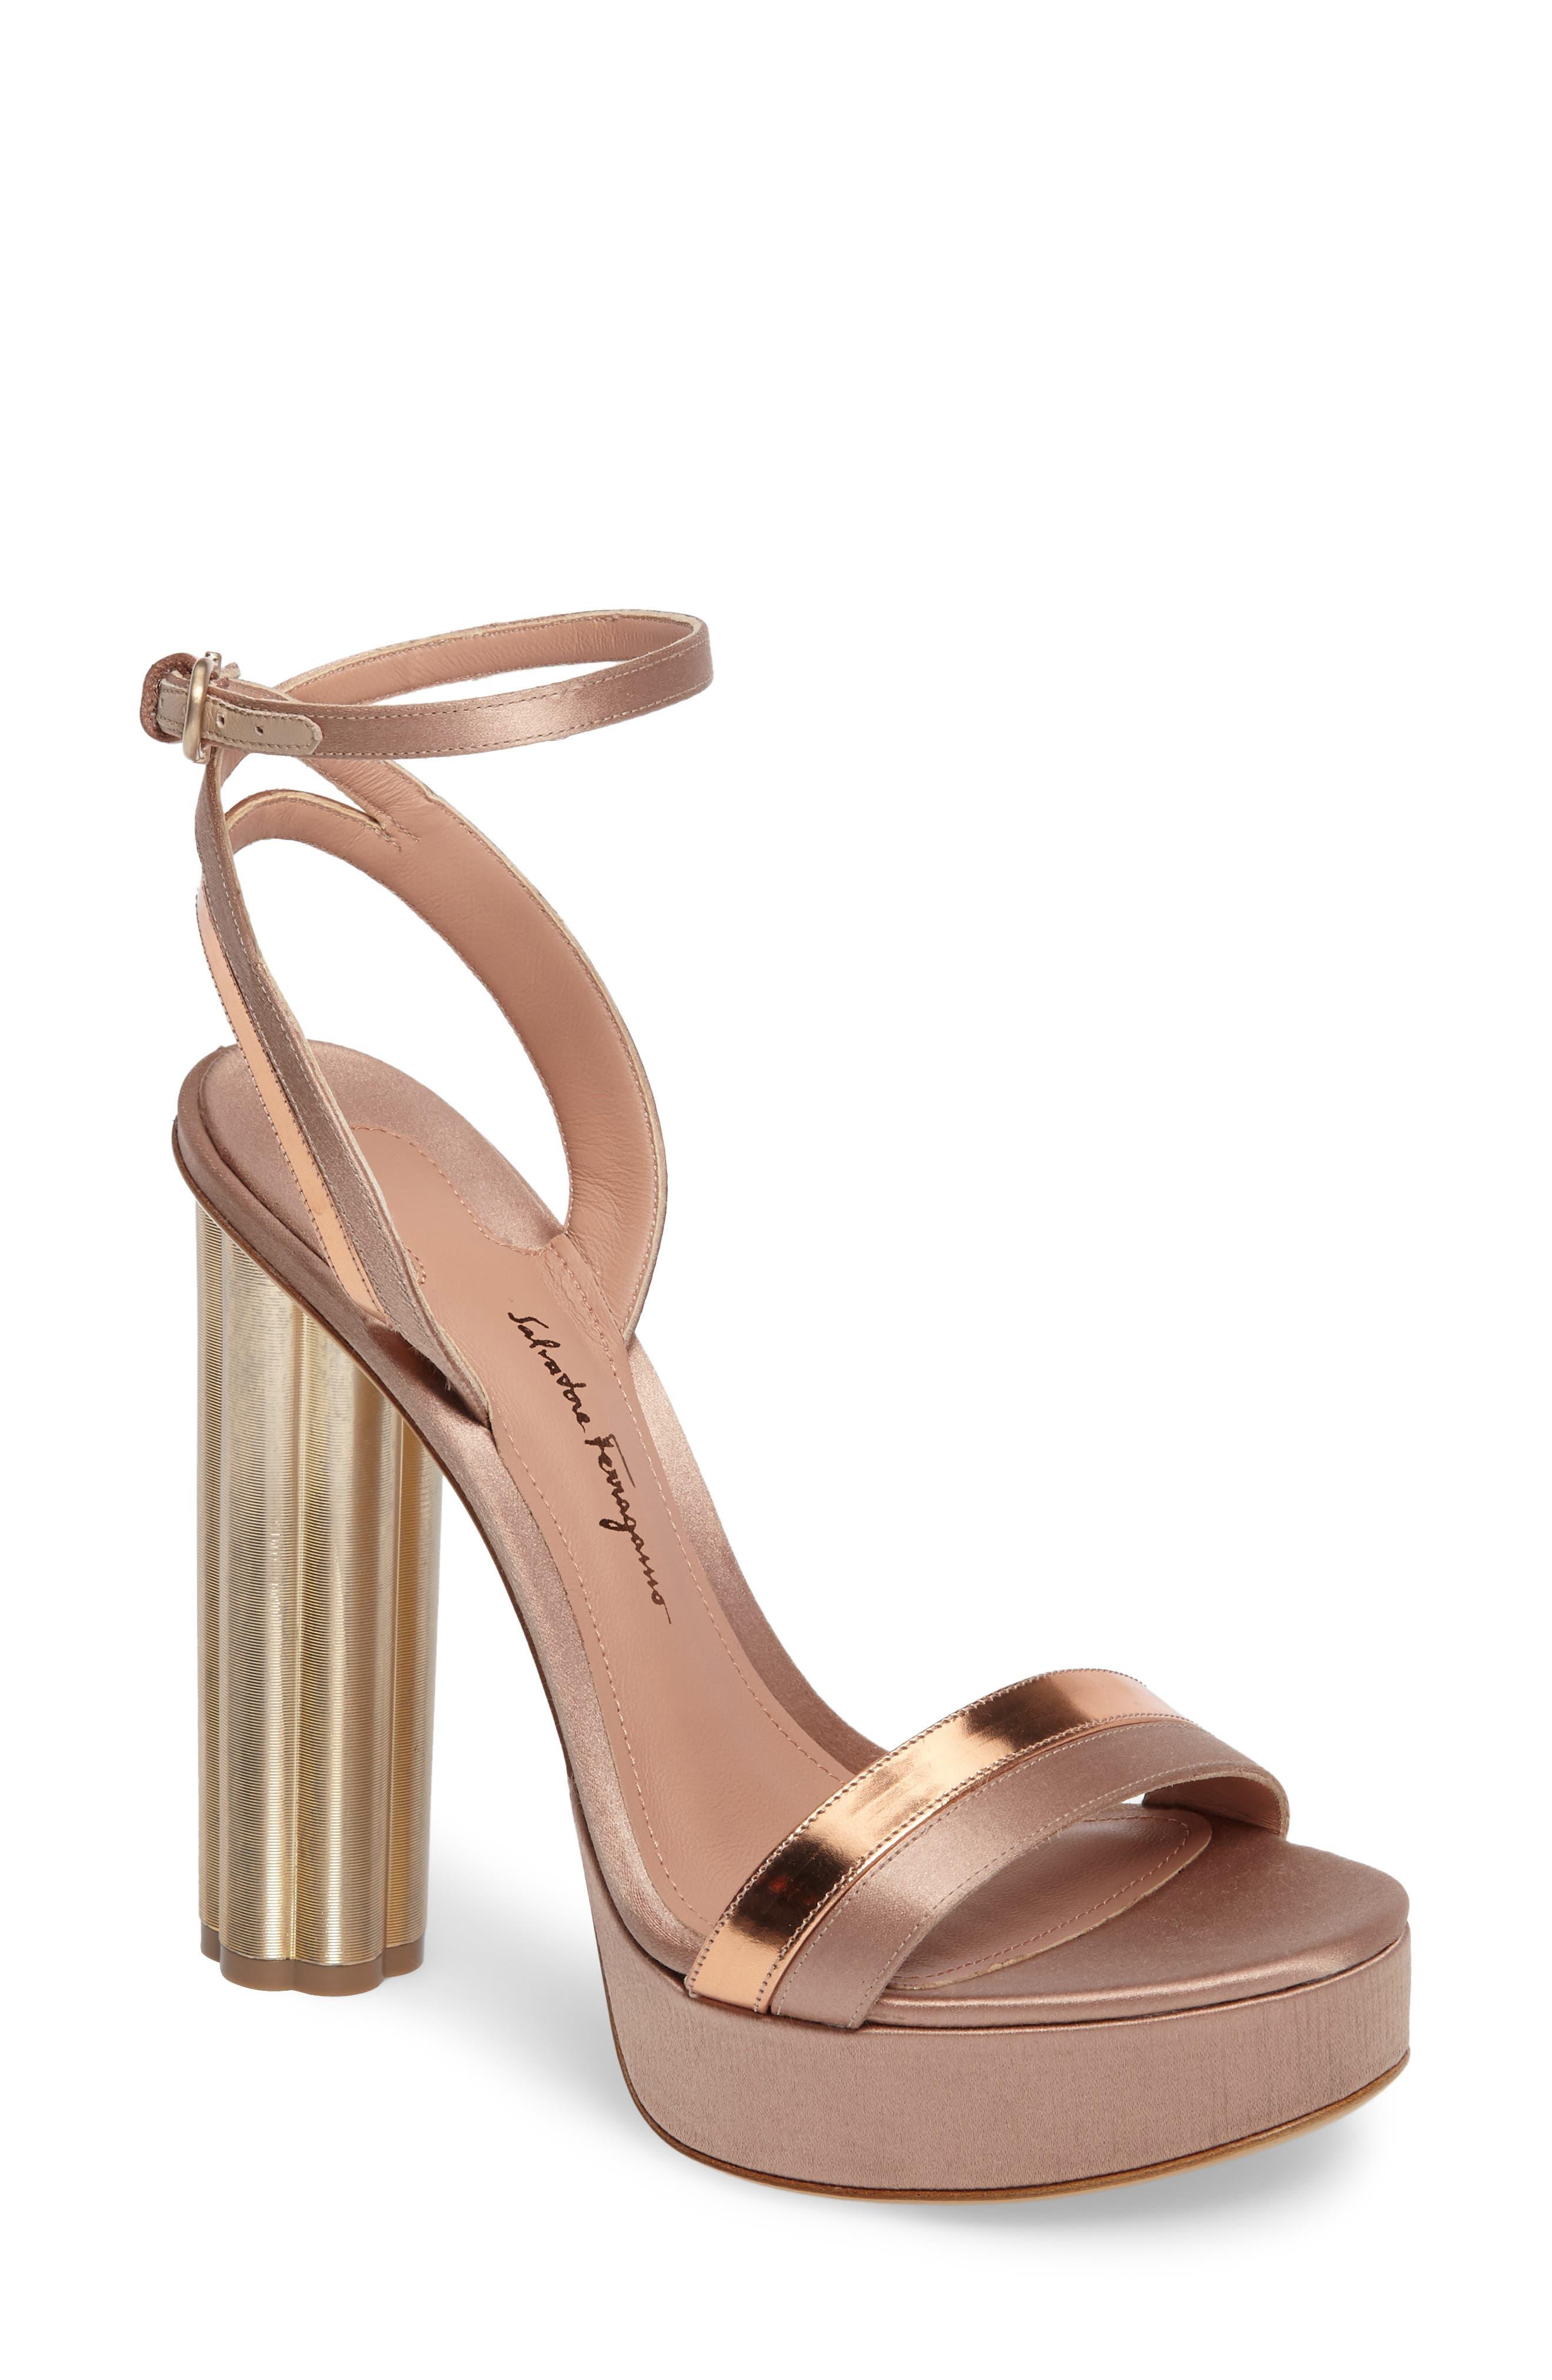 Alternate Image 1 Selected - Salvatore Ferragamo Ankle Strap Platform Sandal (Women)